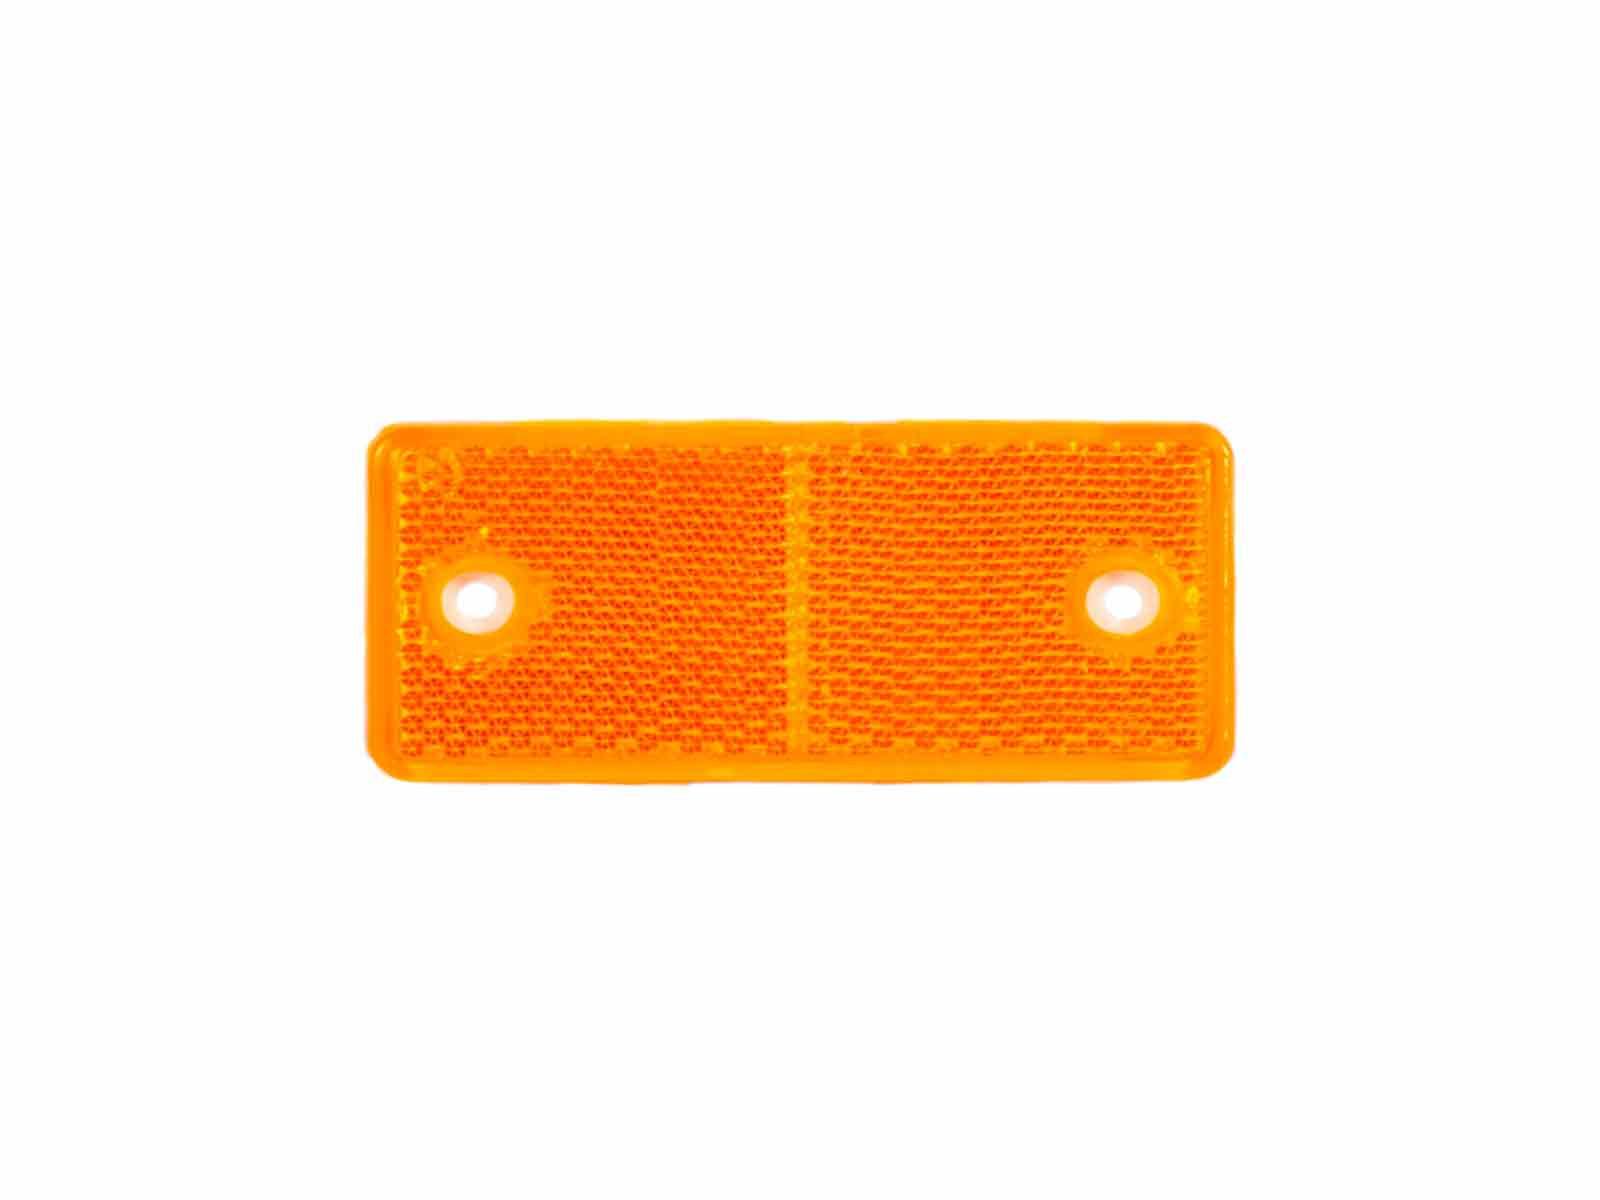 Refleks orange, 94x44x6mm MIB